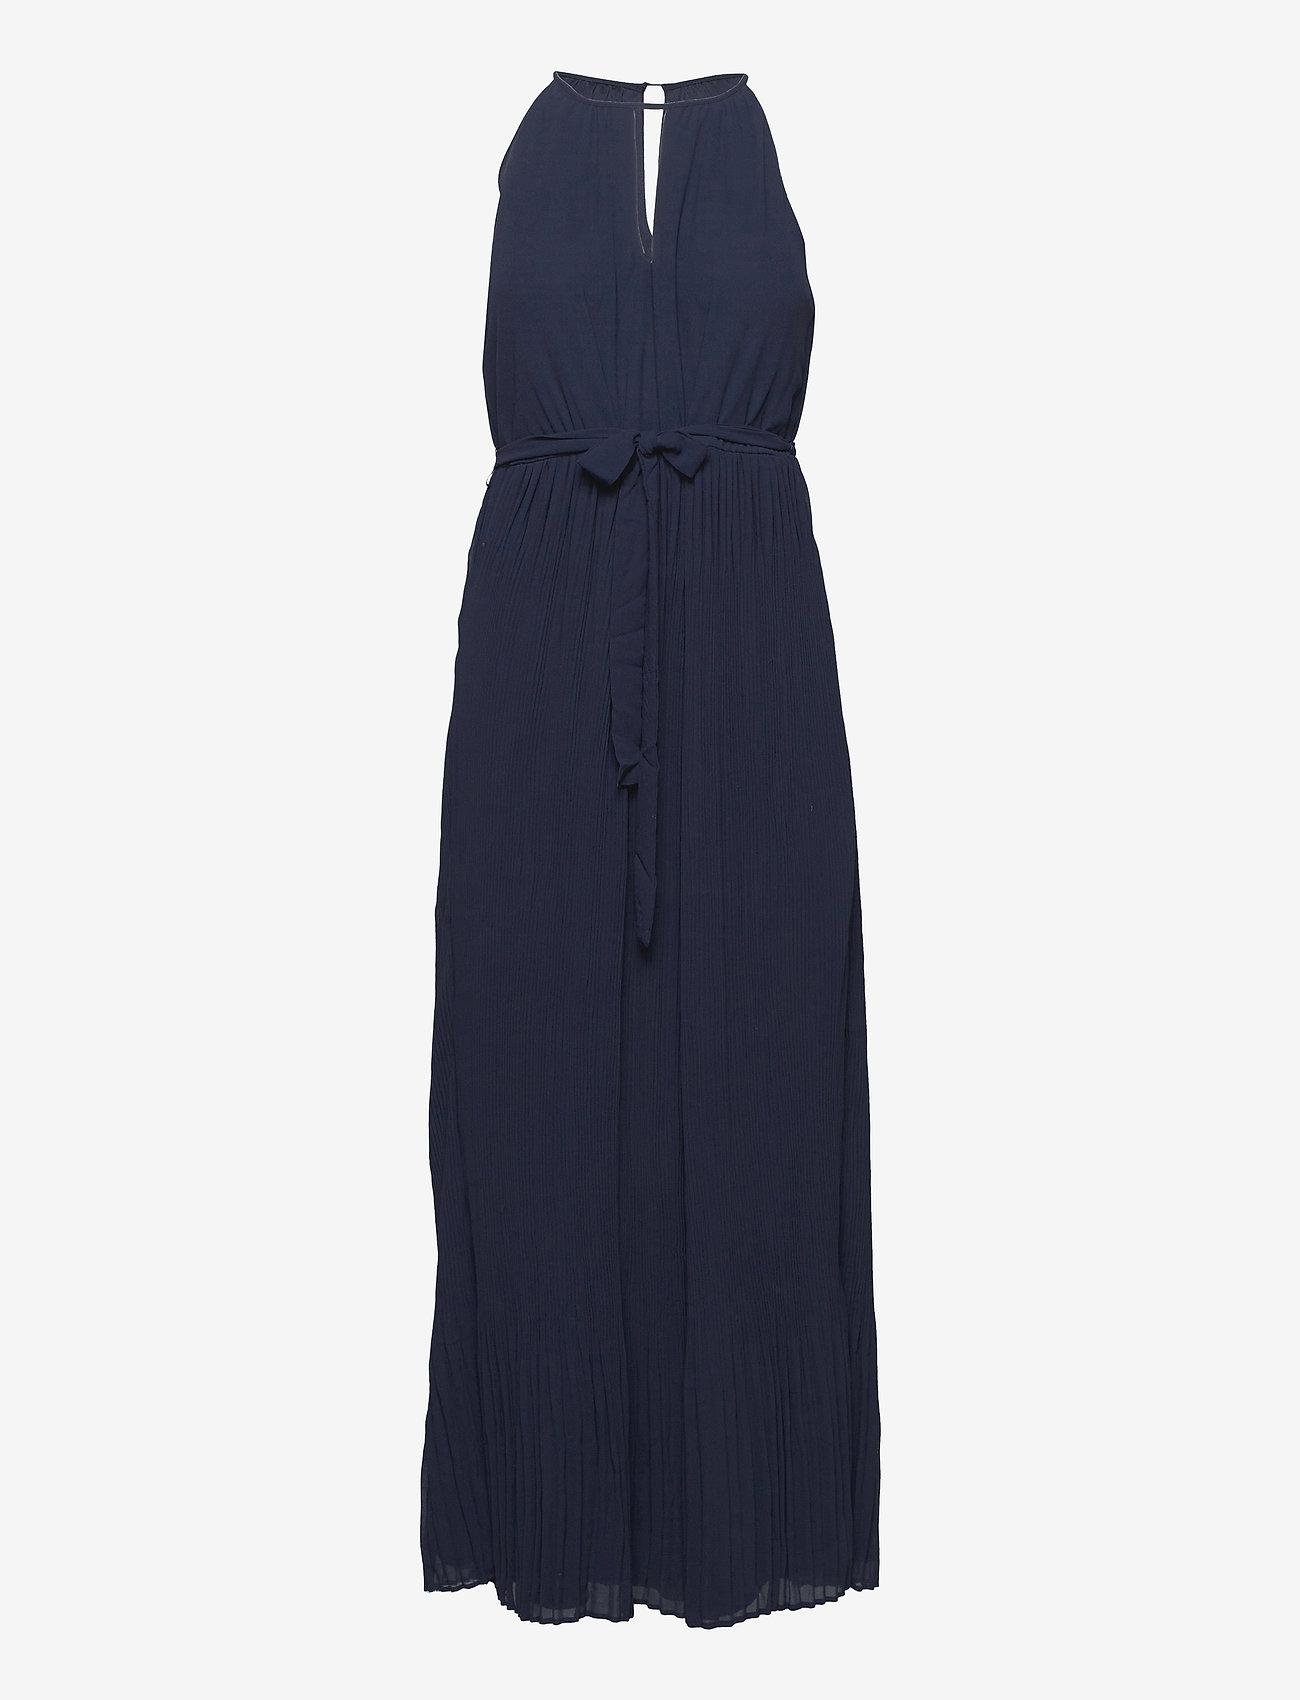 Vila - VIKATELYN HALTERNECK DRESS/DC/SU - sommerkjoler - navy blazer - 0